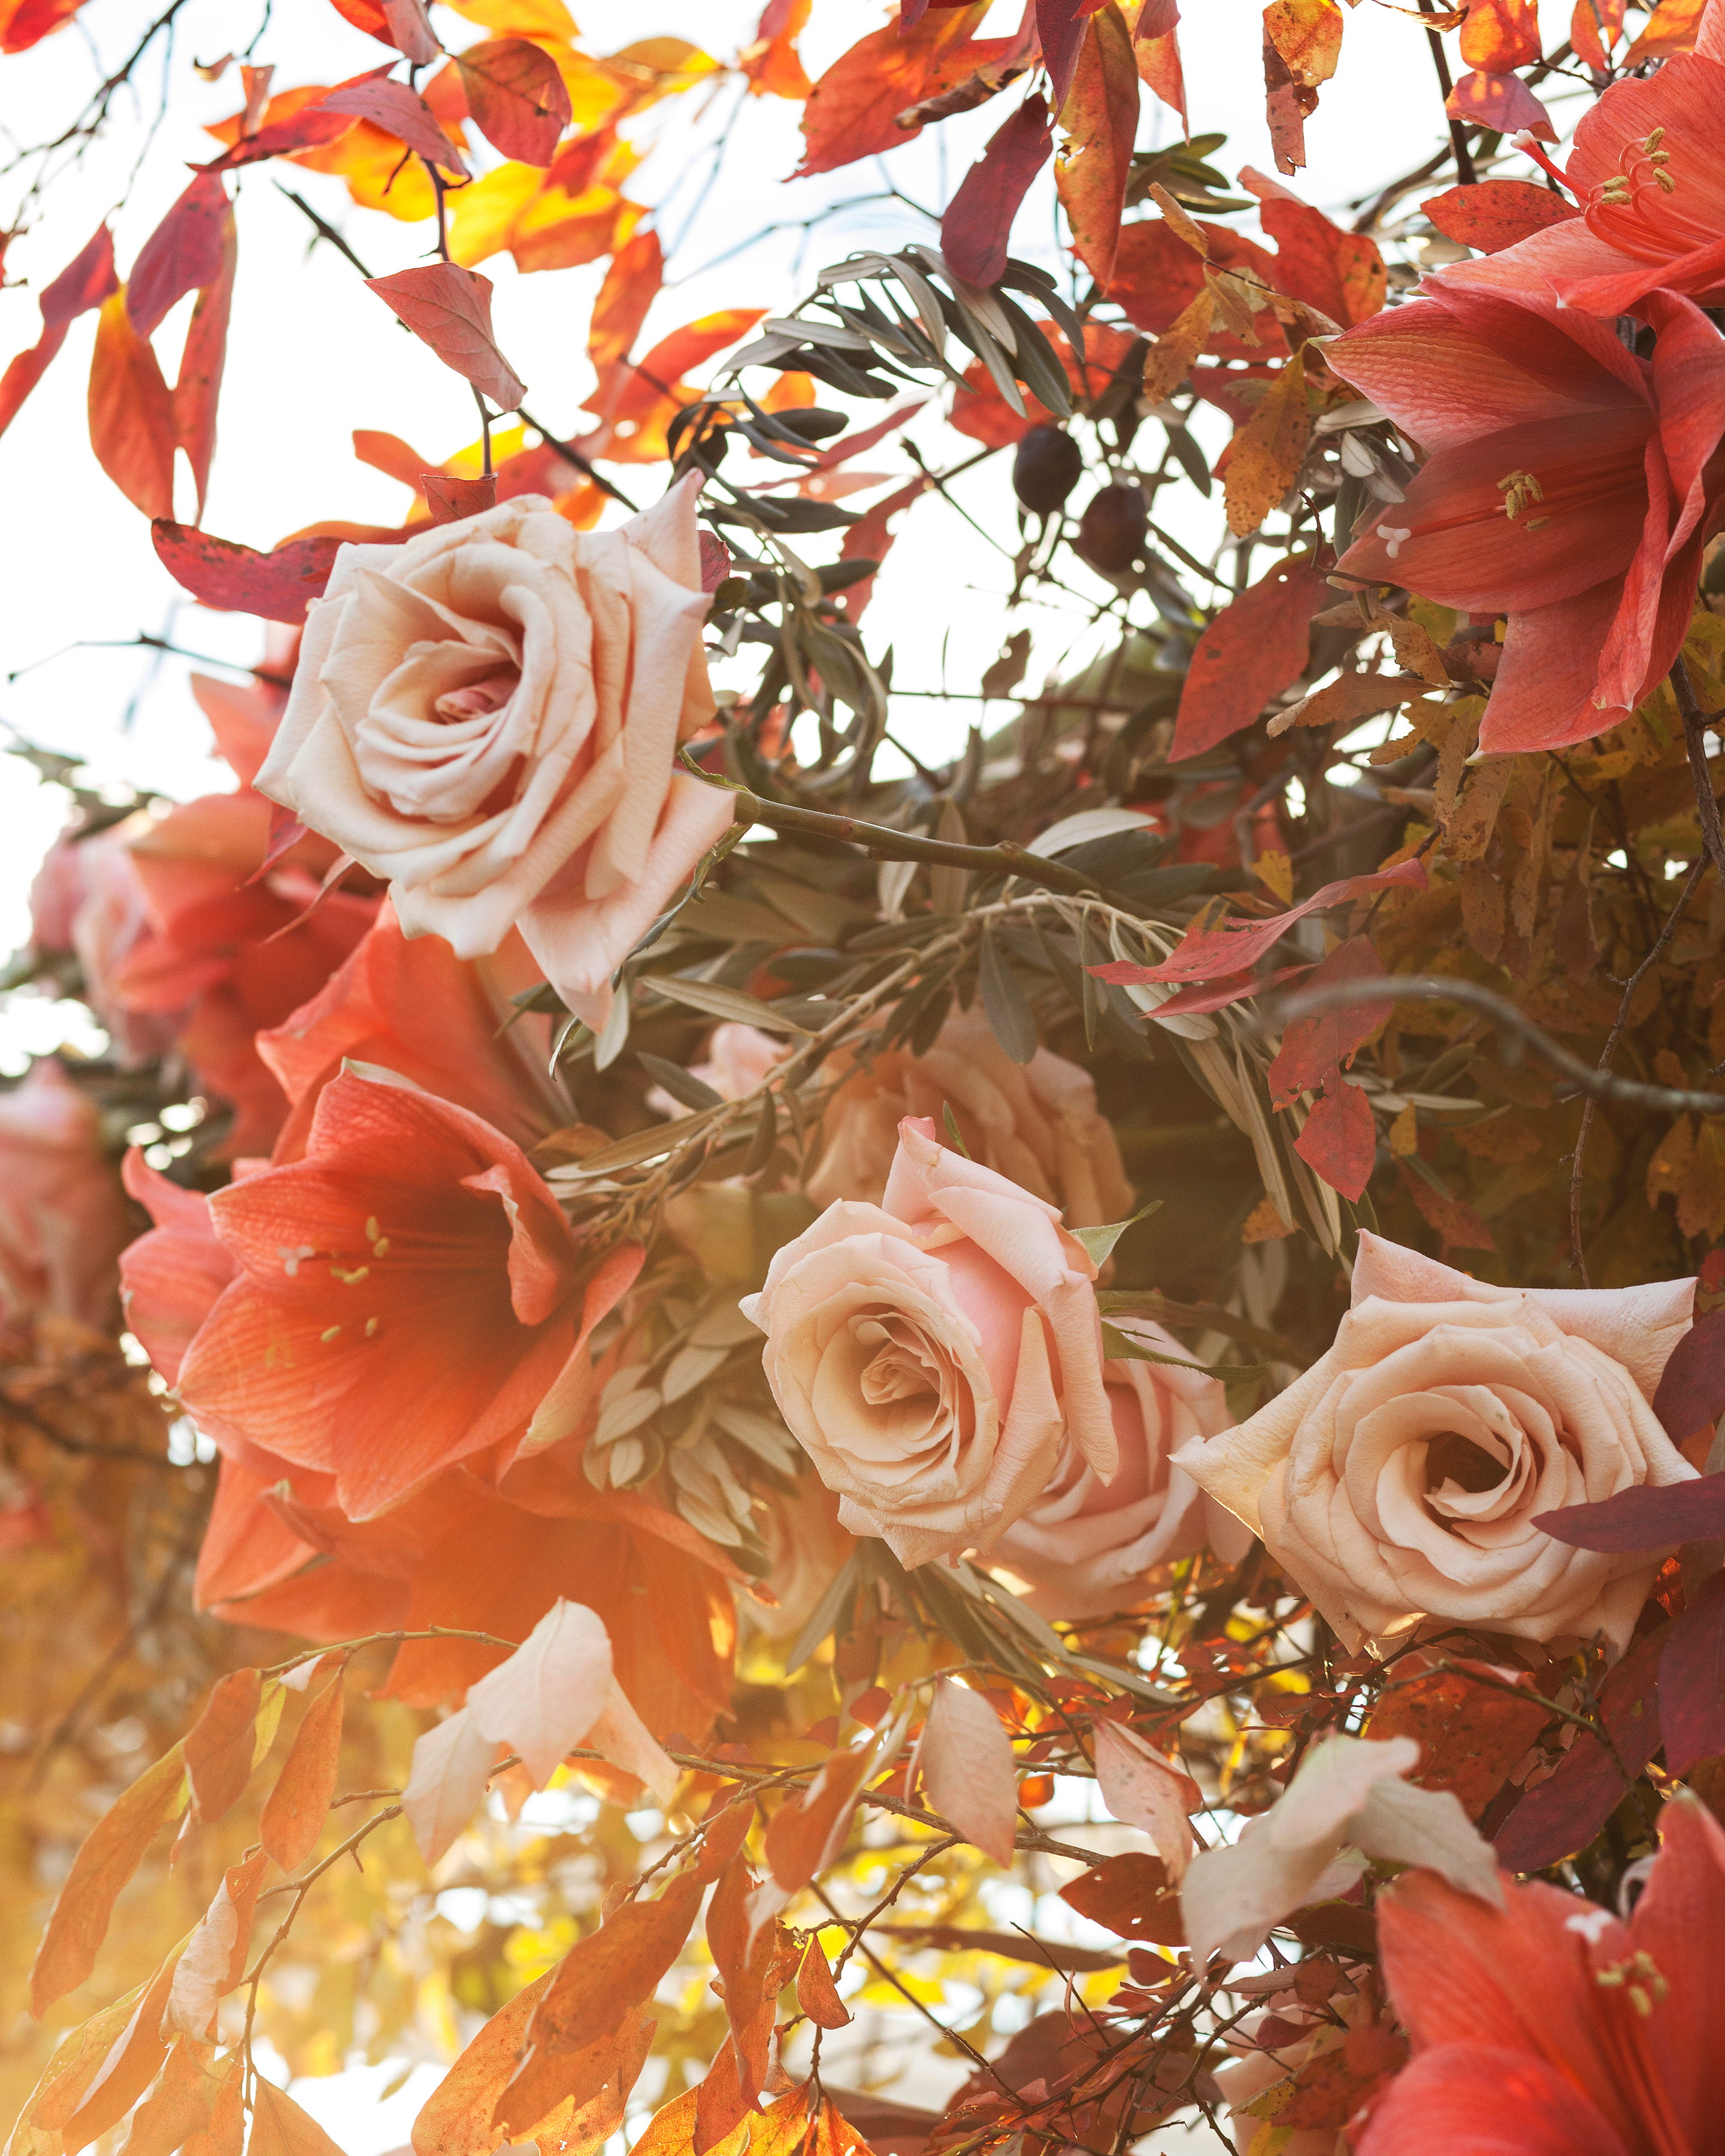 hanna-jimm-wedding-flowers-054-s111413-0814.jpg